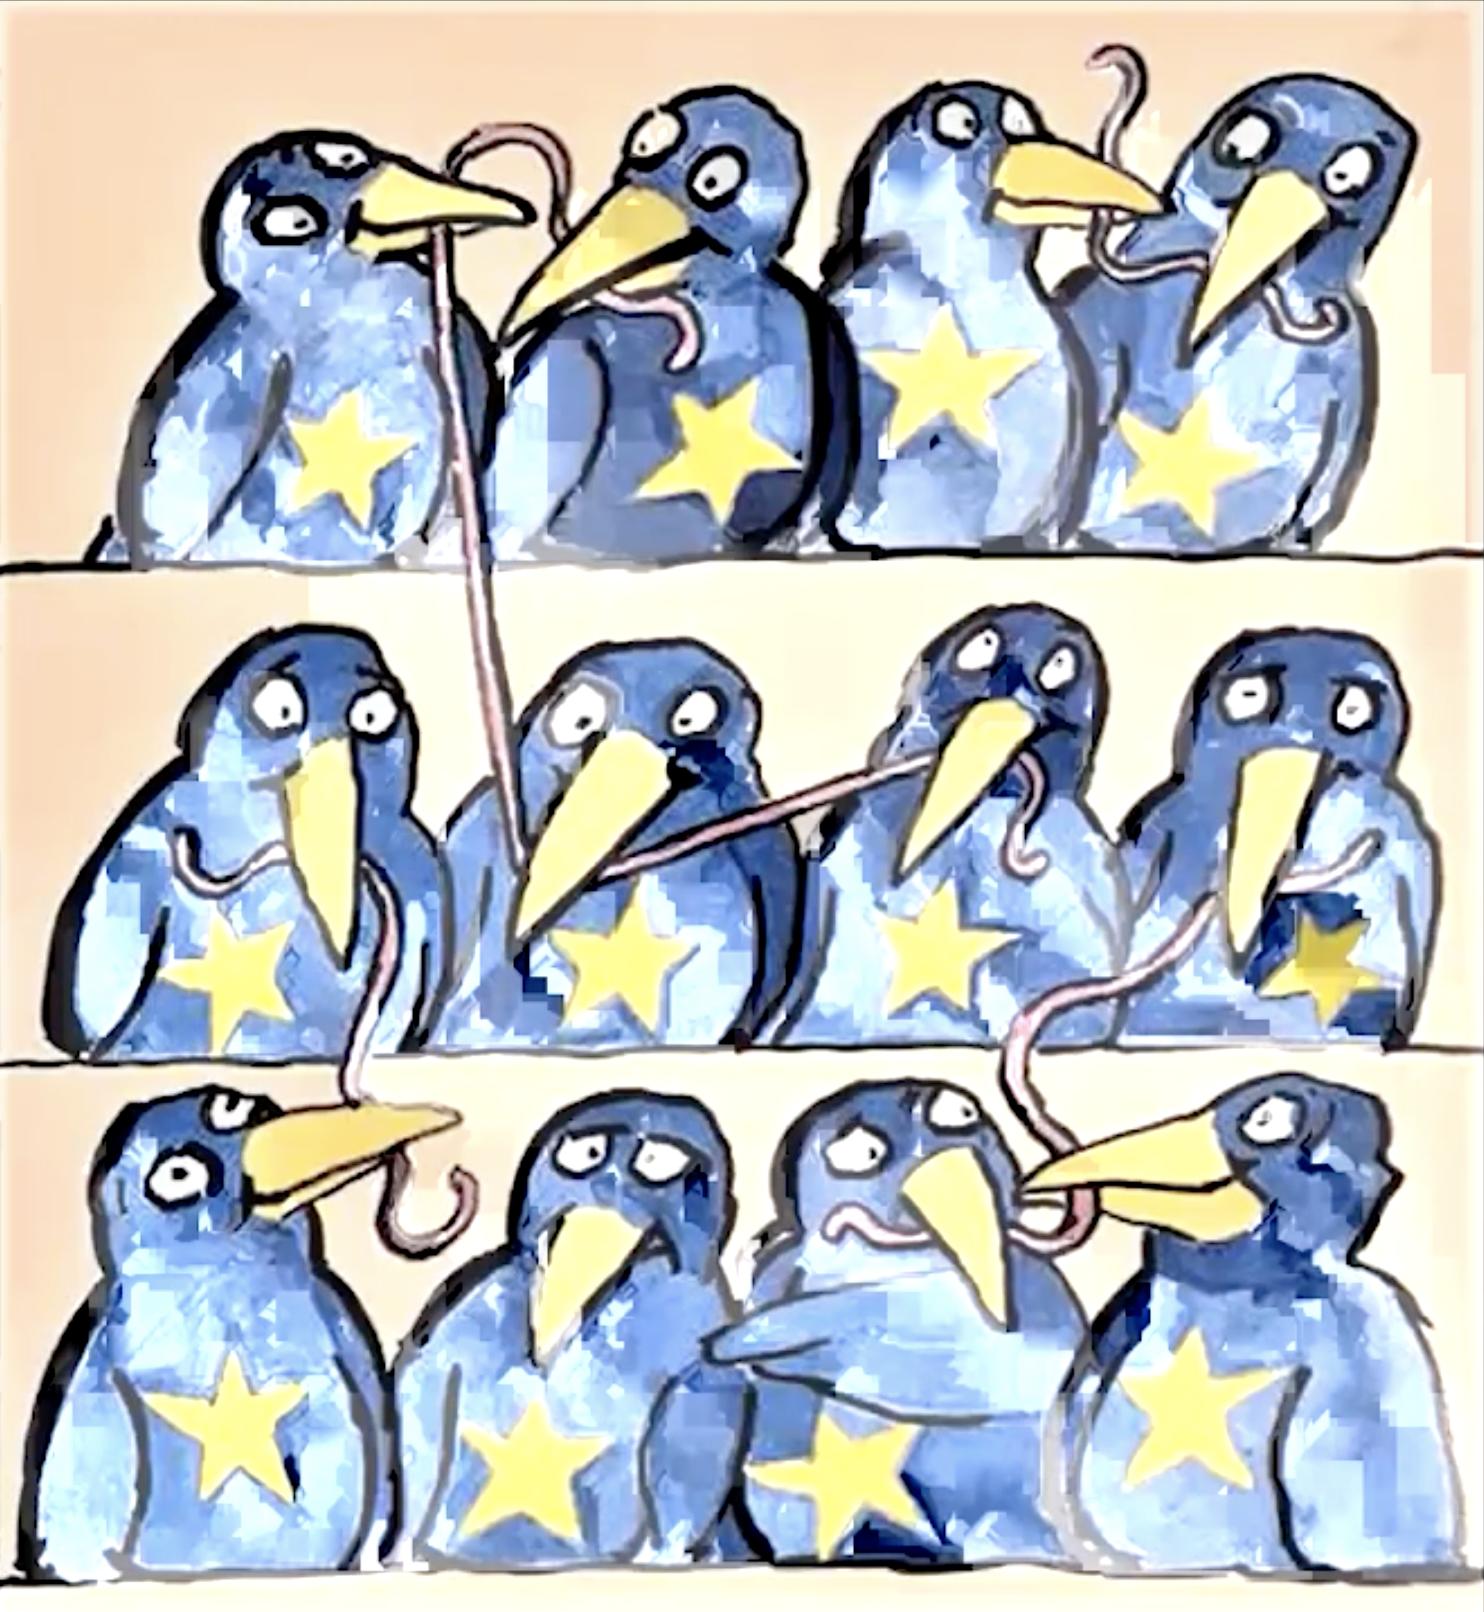 dessin_Tomi_Ungerer_les_Europeens_s_entraident